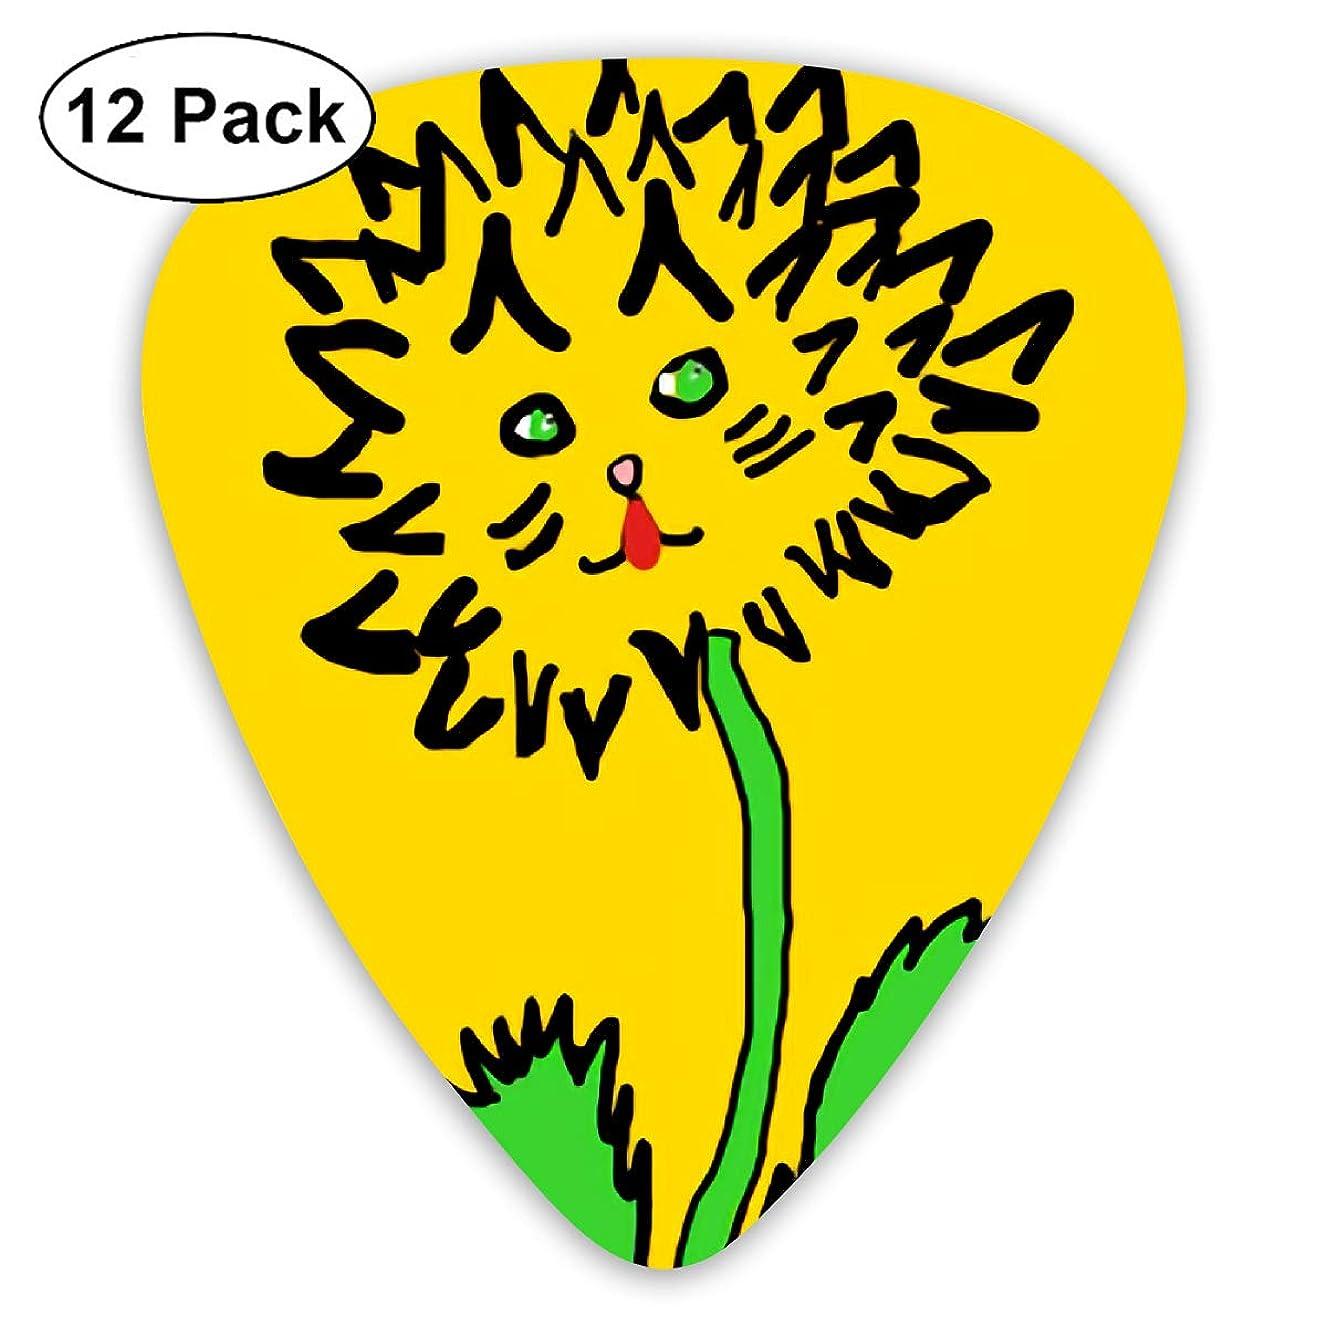 Lion Sunflower Graffiti Bendy Ultra Thin 0.46 Med 0.73 Thick 0.96mm 4 Pieces Each Base Prime Plastic Jazz Mandolin Bass Ukelele Guitar Pick Plectrum Display